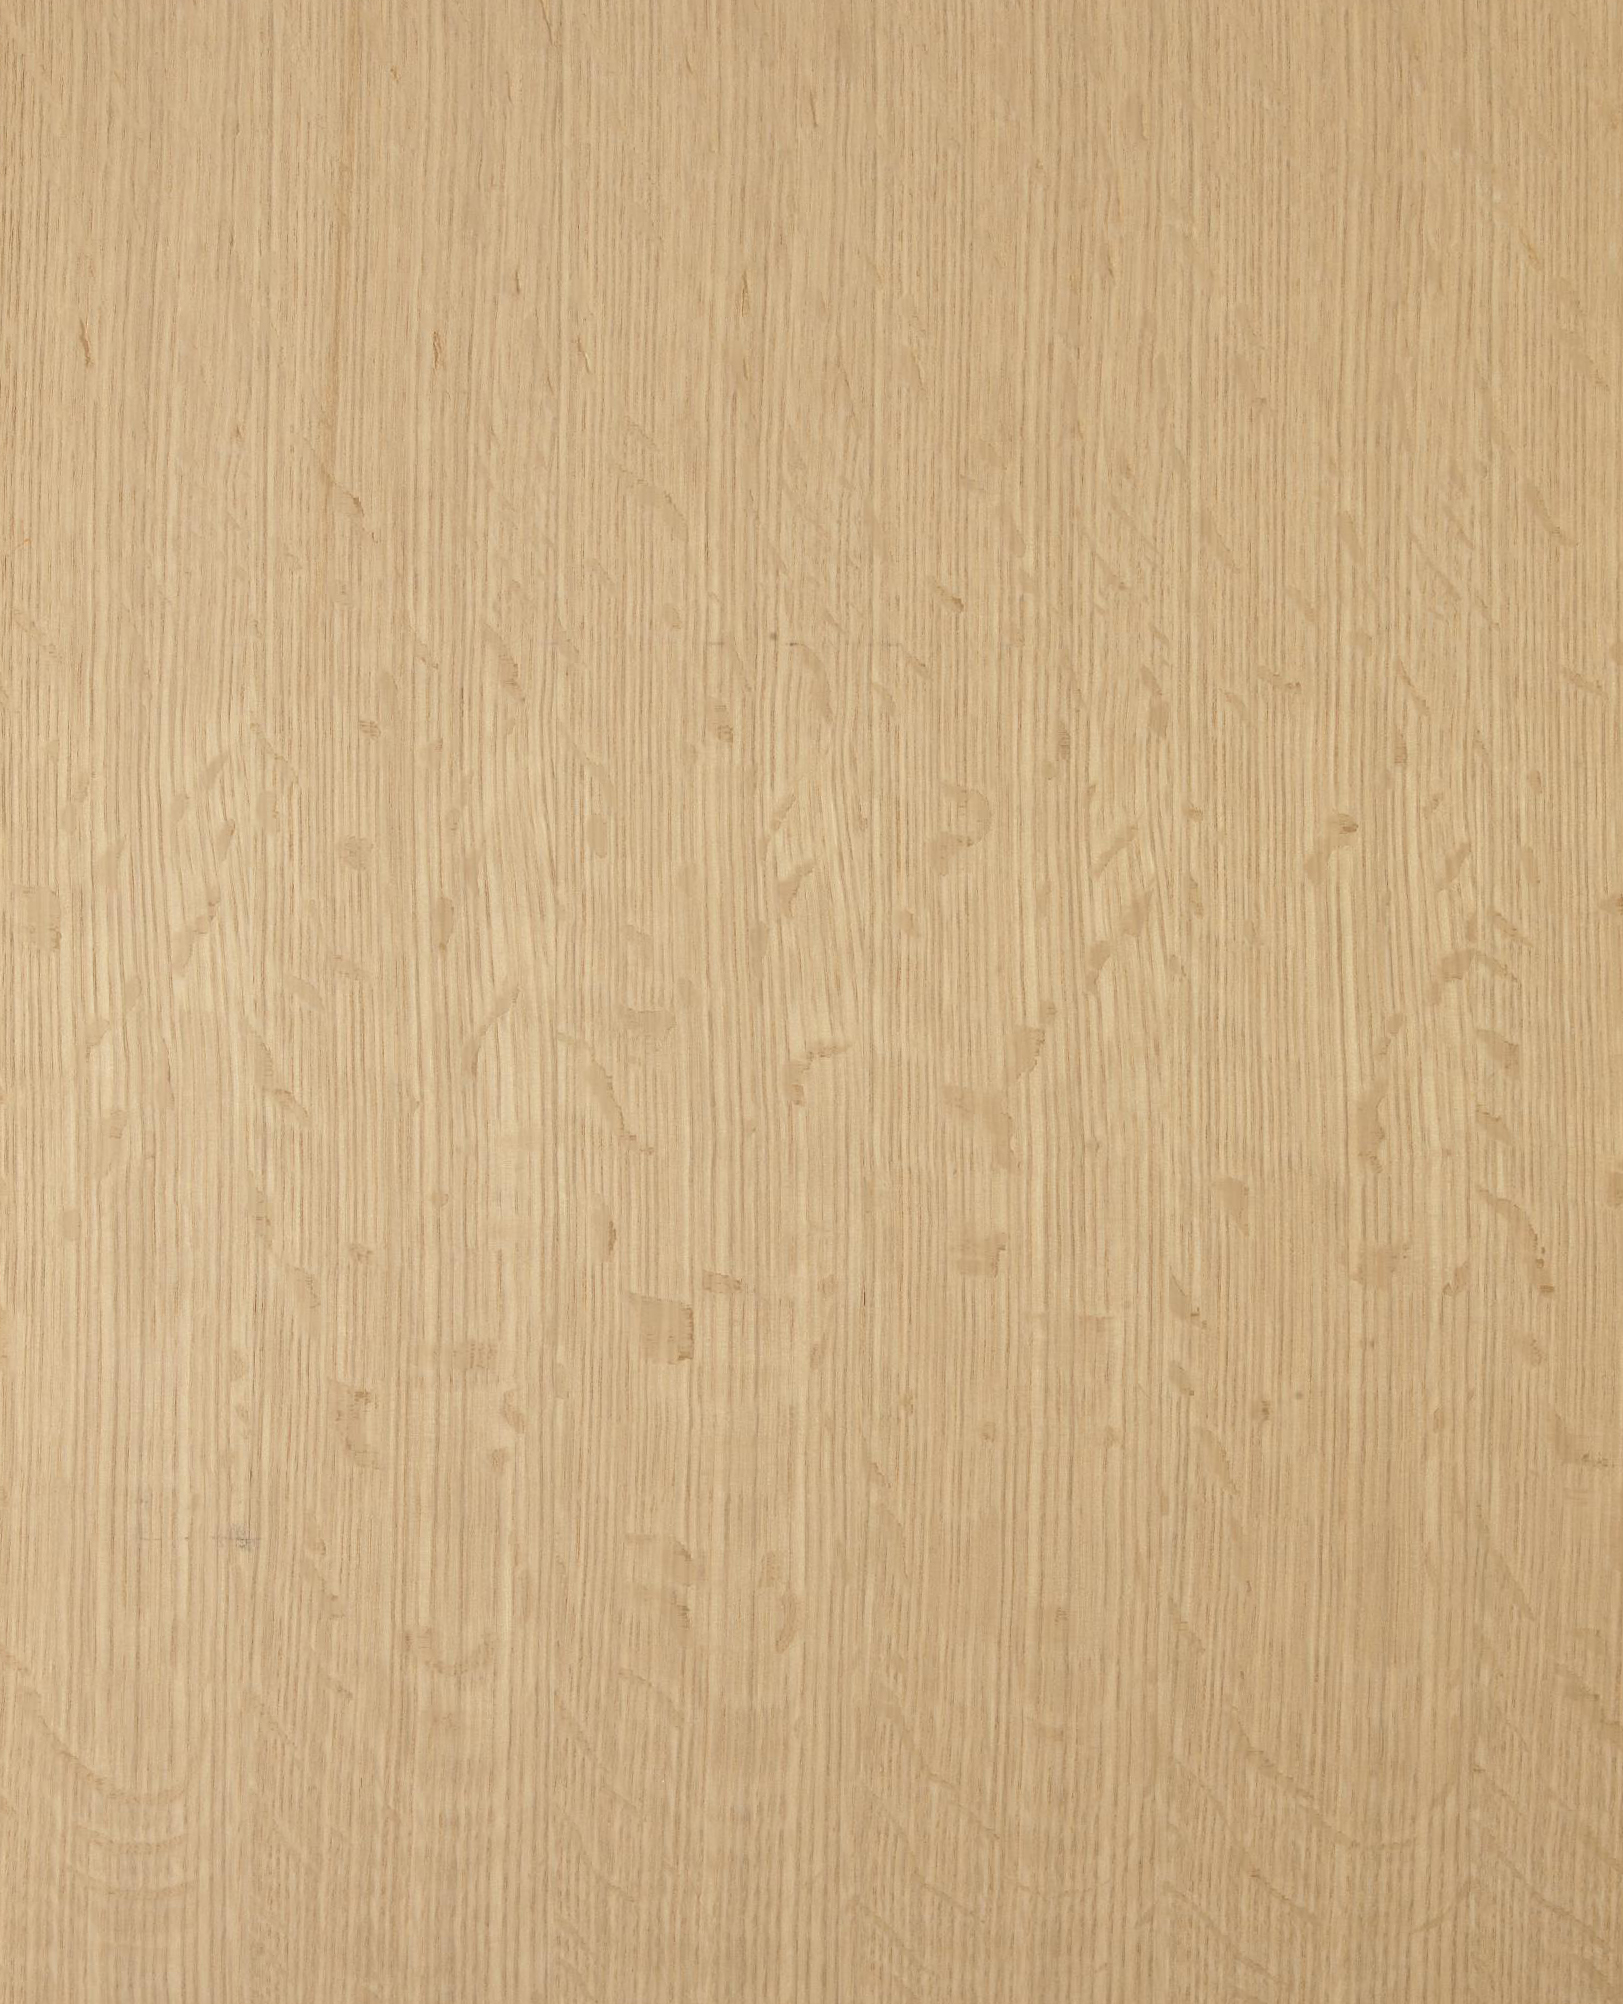 White Oak Wood Grain